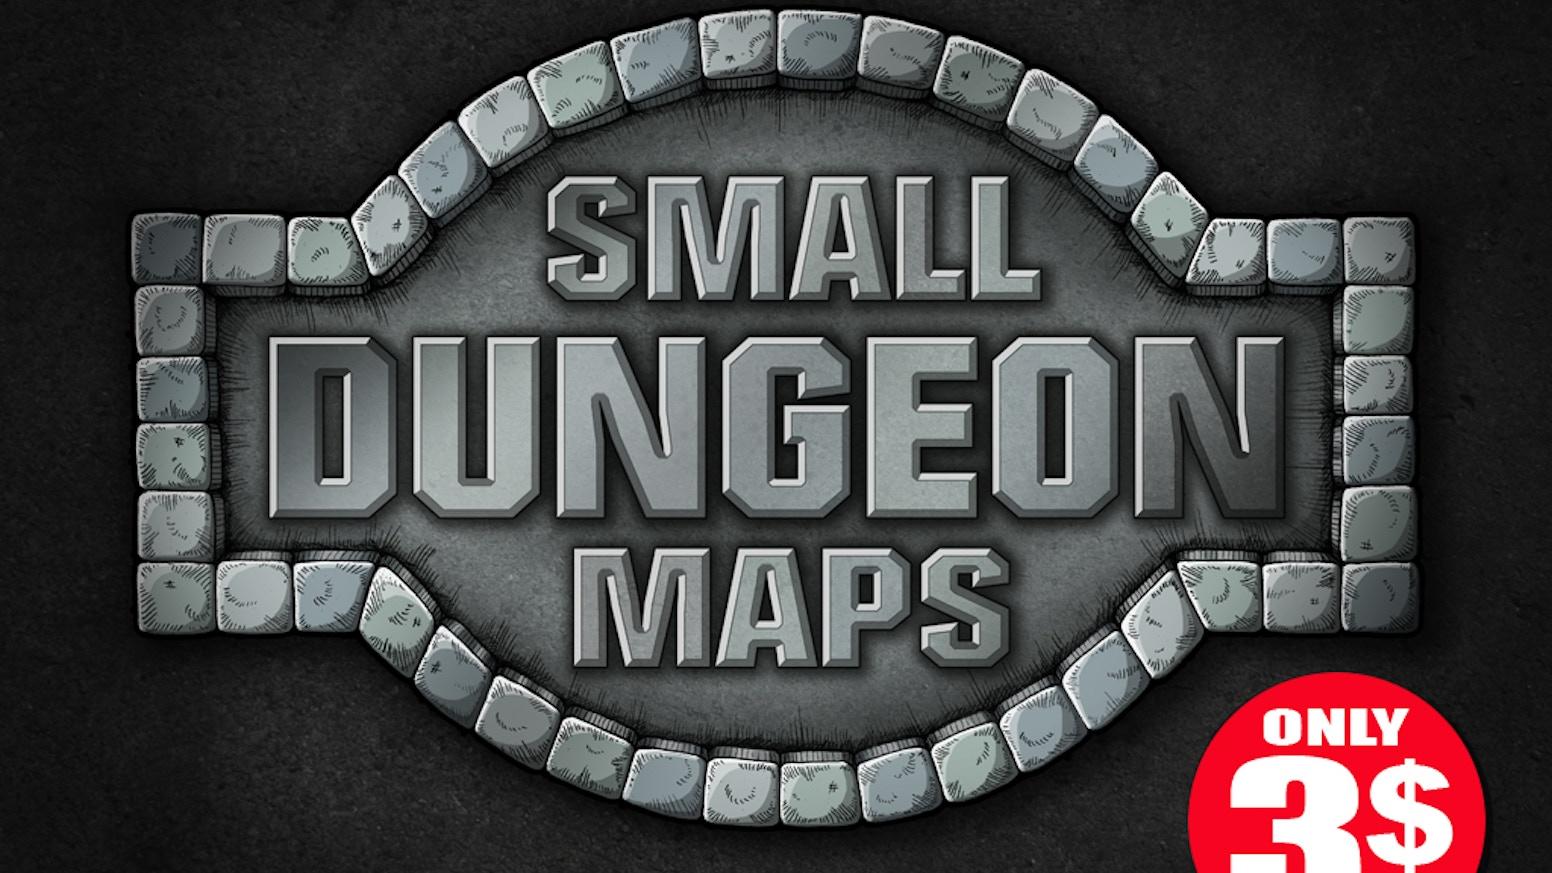 Small Dungeon Maps by Jean Francois Senay — Kickstarter